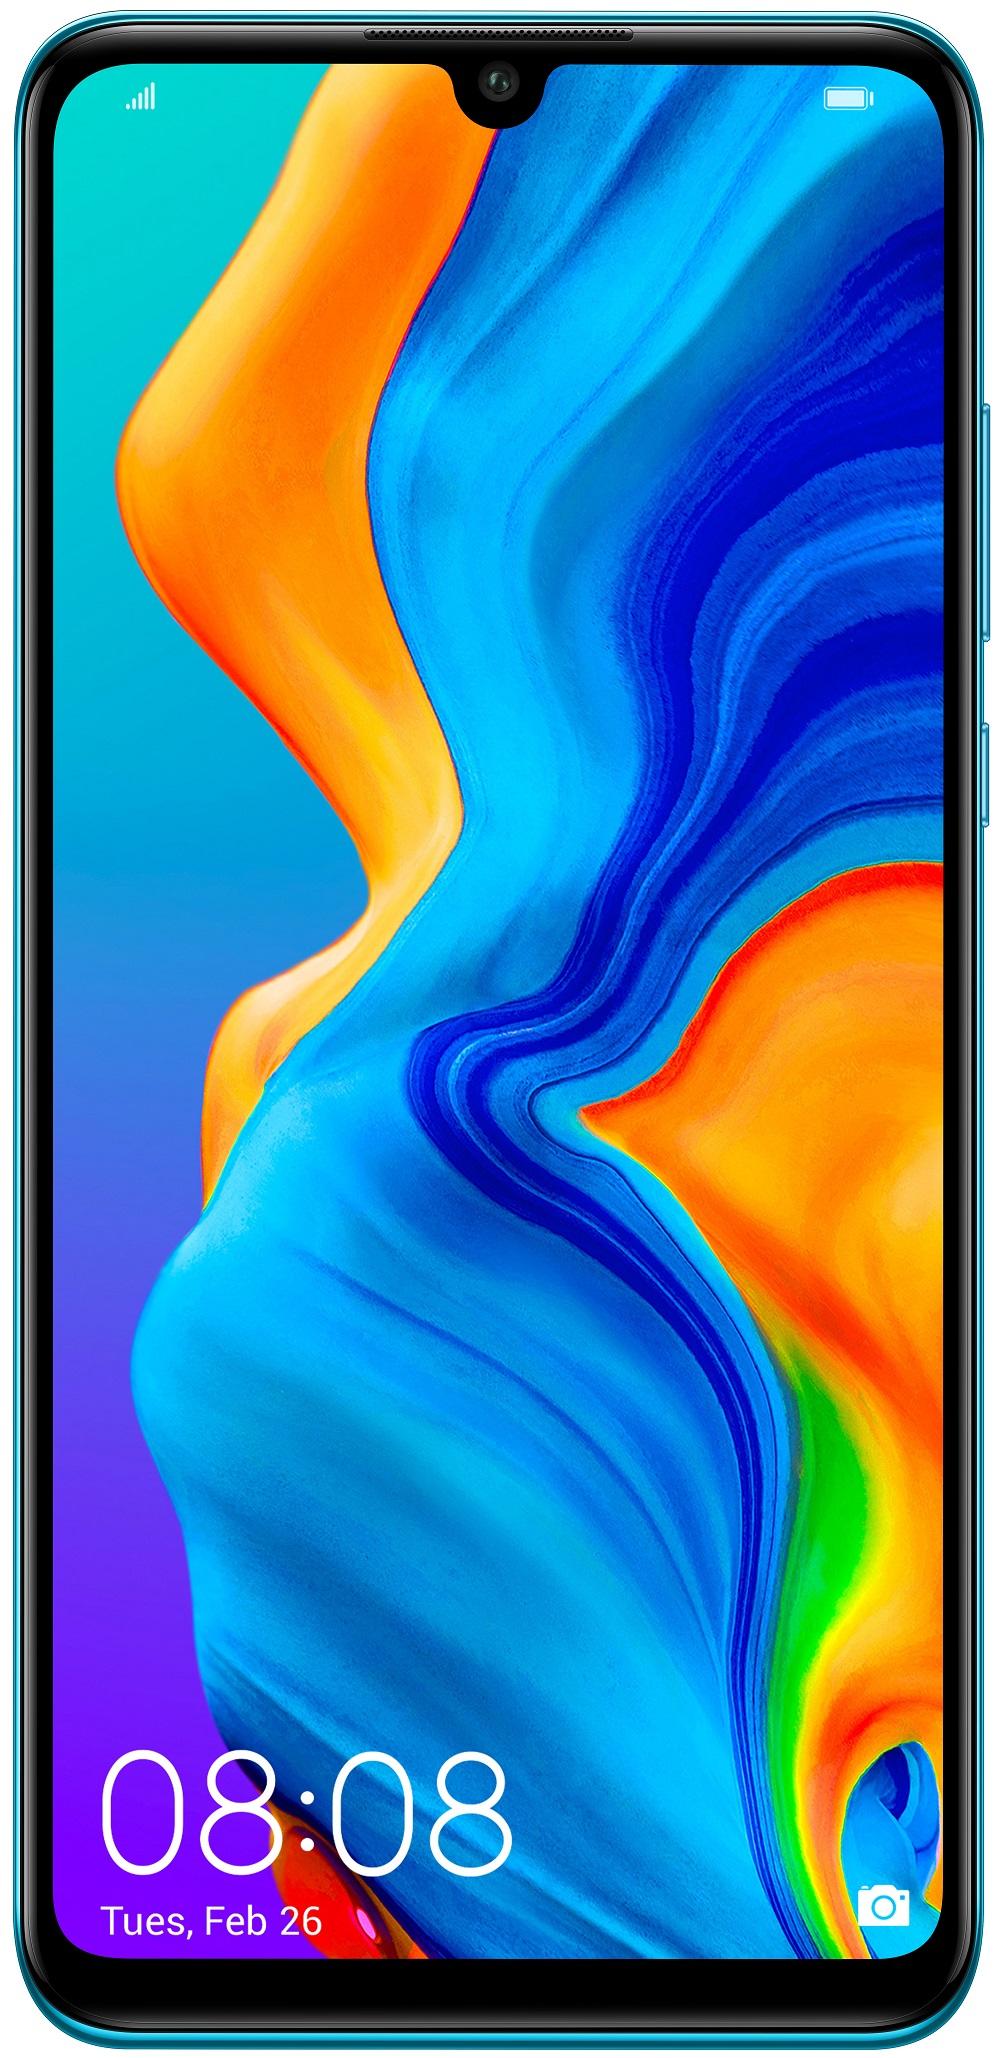 Купить Мобільні телефони, Смартфон Huawei P30 Lite 4/64GB 51094VCL Peacock Blue (51094VBV)